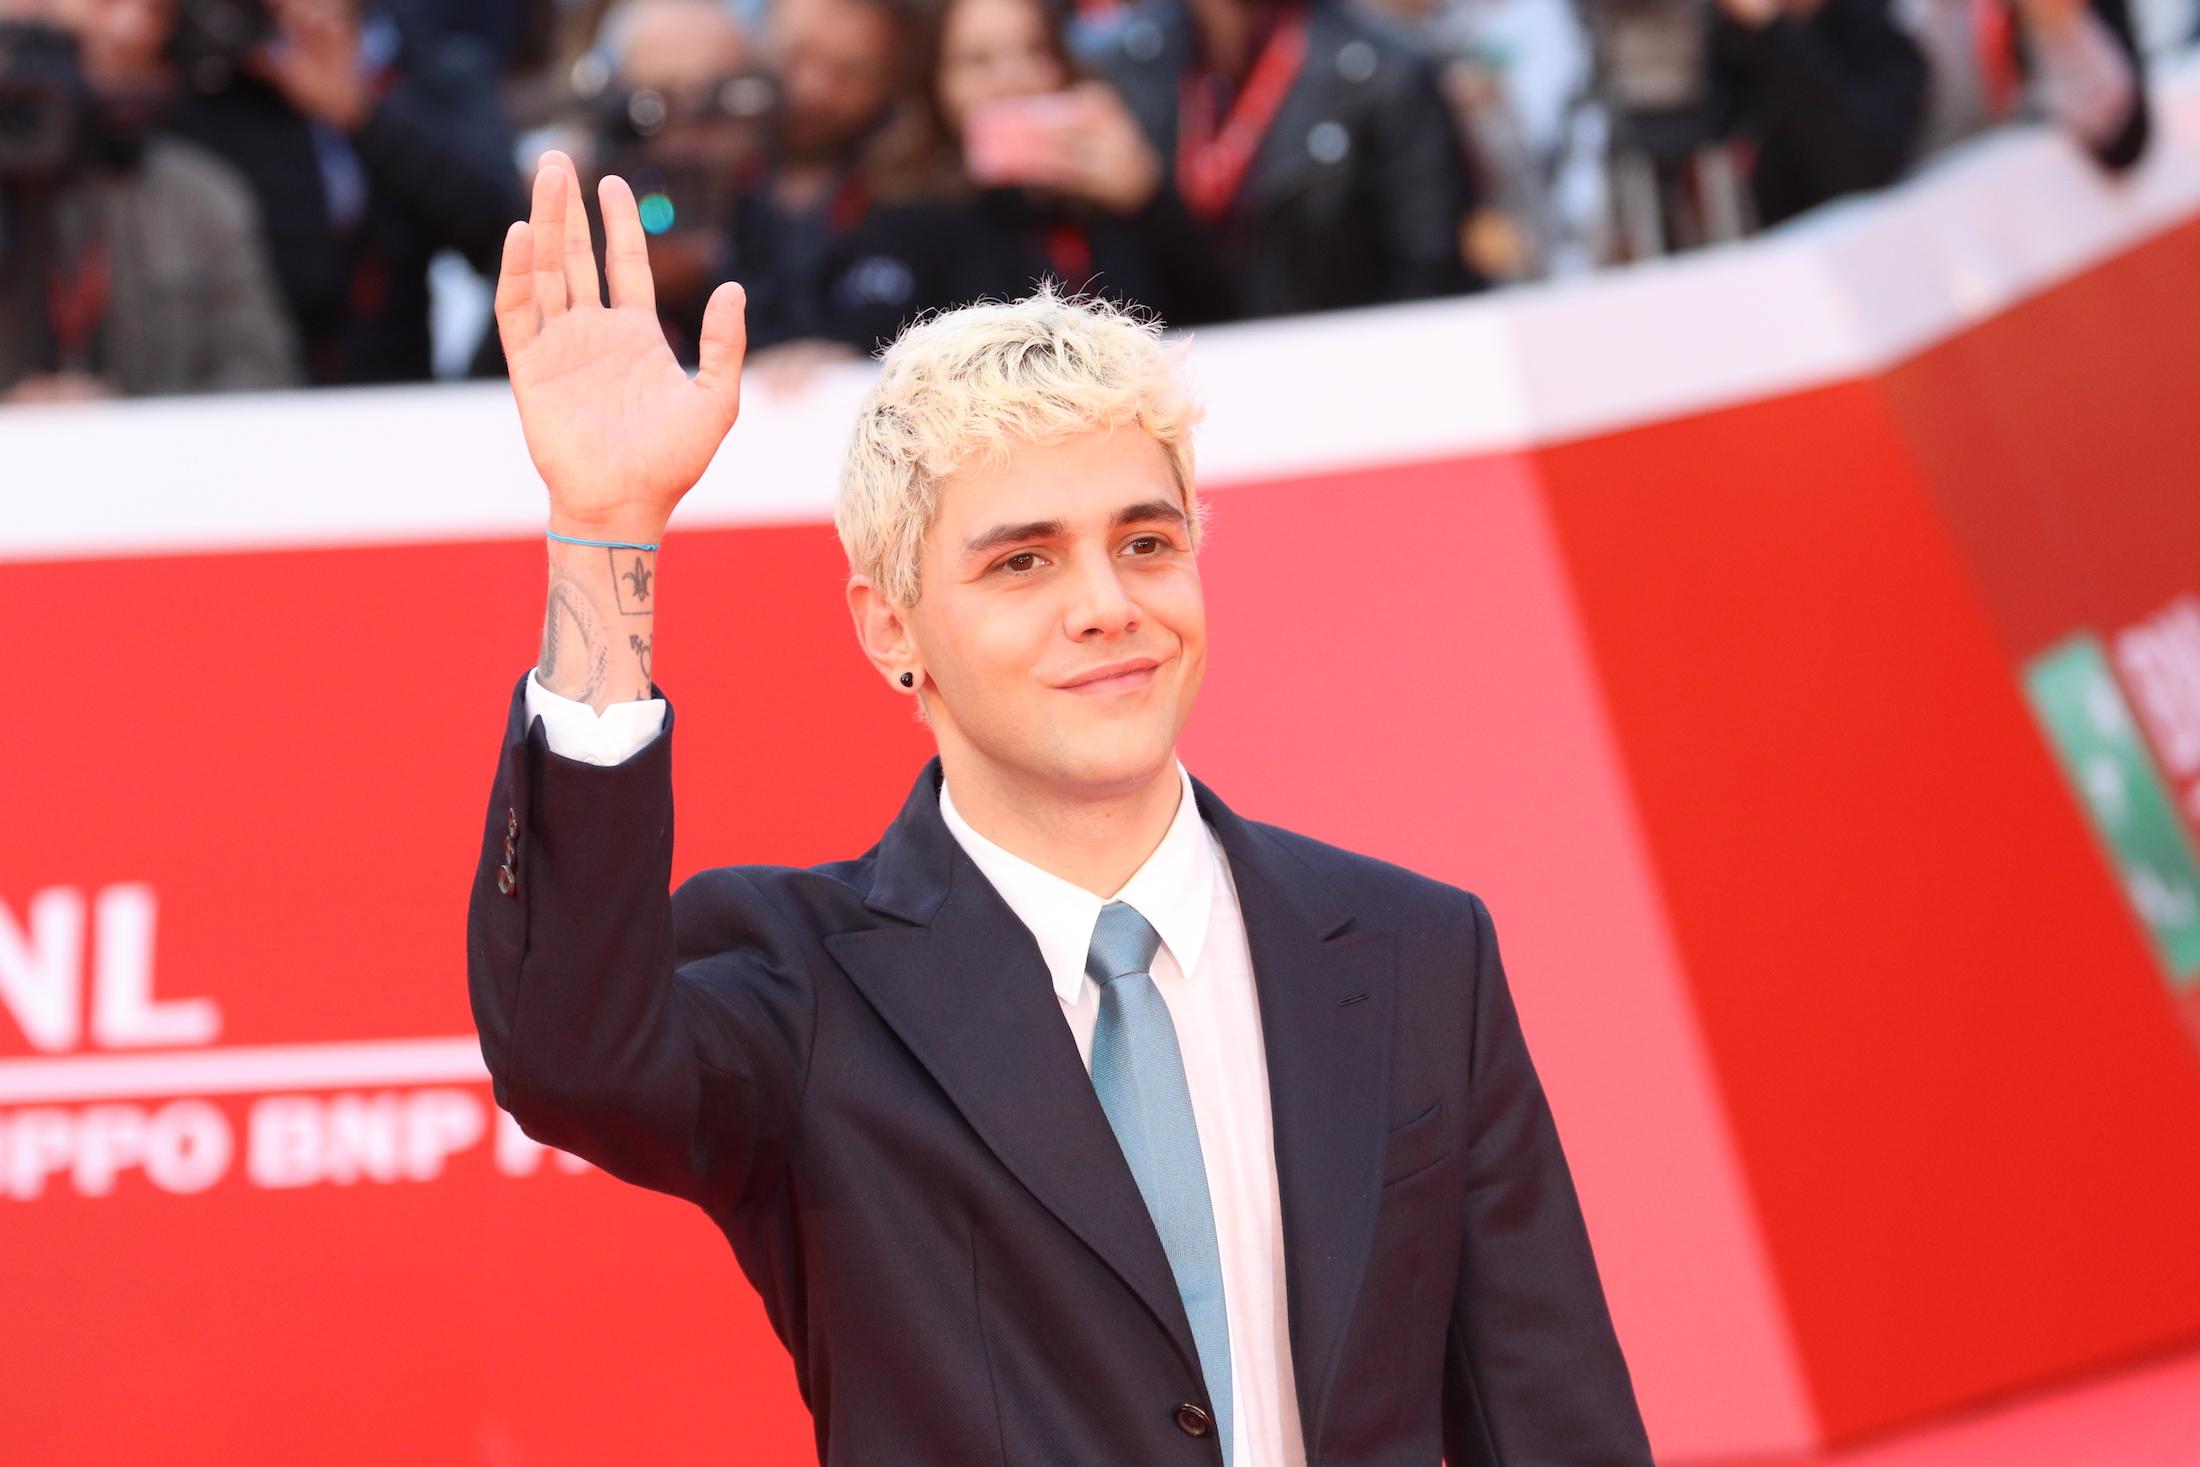 Roma 2017: Xavier Dolan saluta sul red carpet